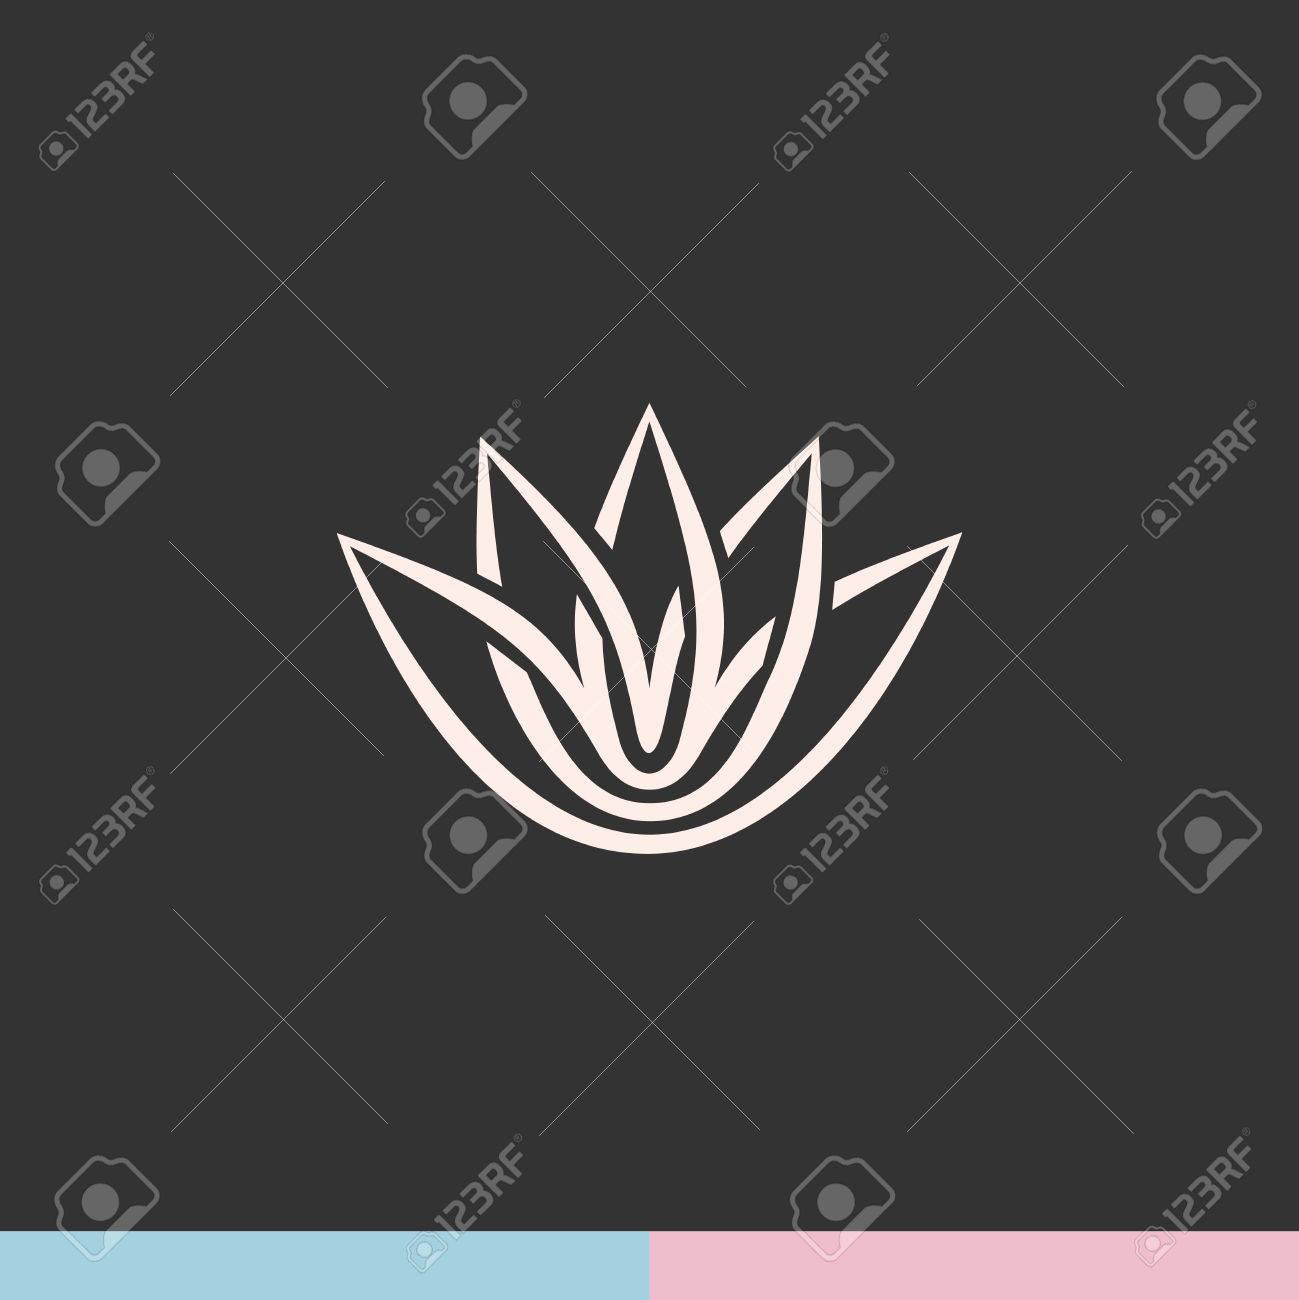 Lotus flower silhouette logo royalty free cliparts vectors and lotus flower silhouette logo stock vector 41658962 izmirmasajfo